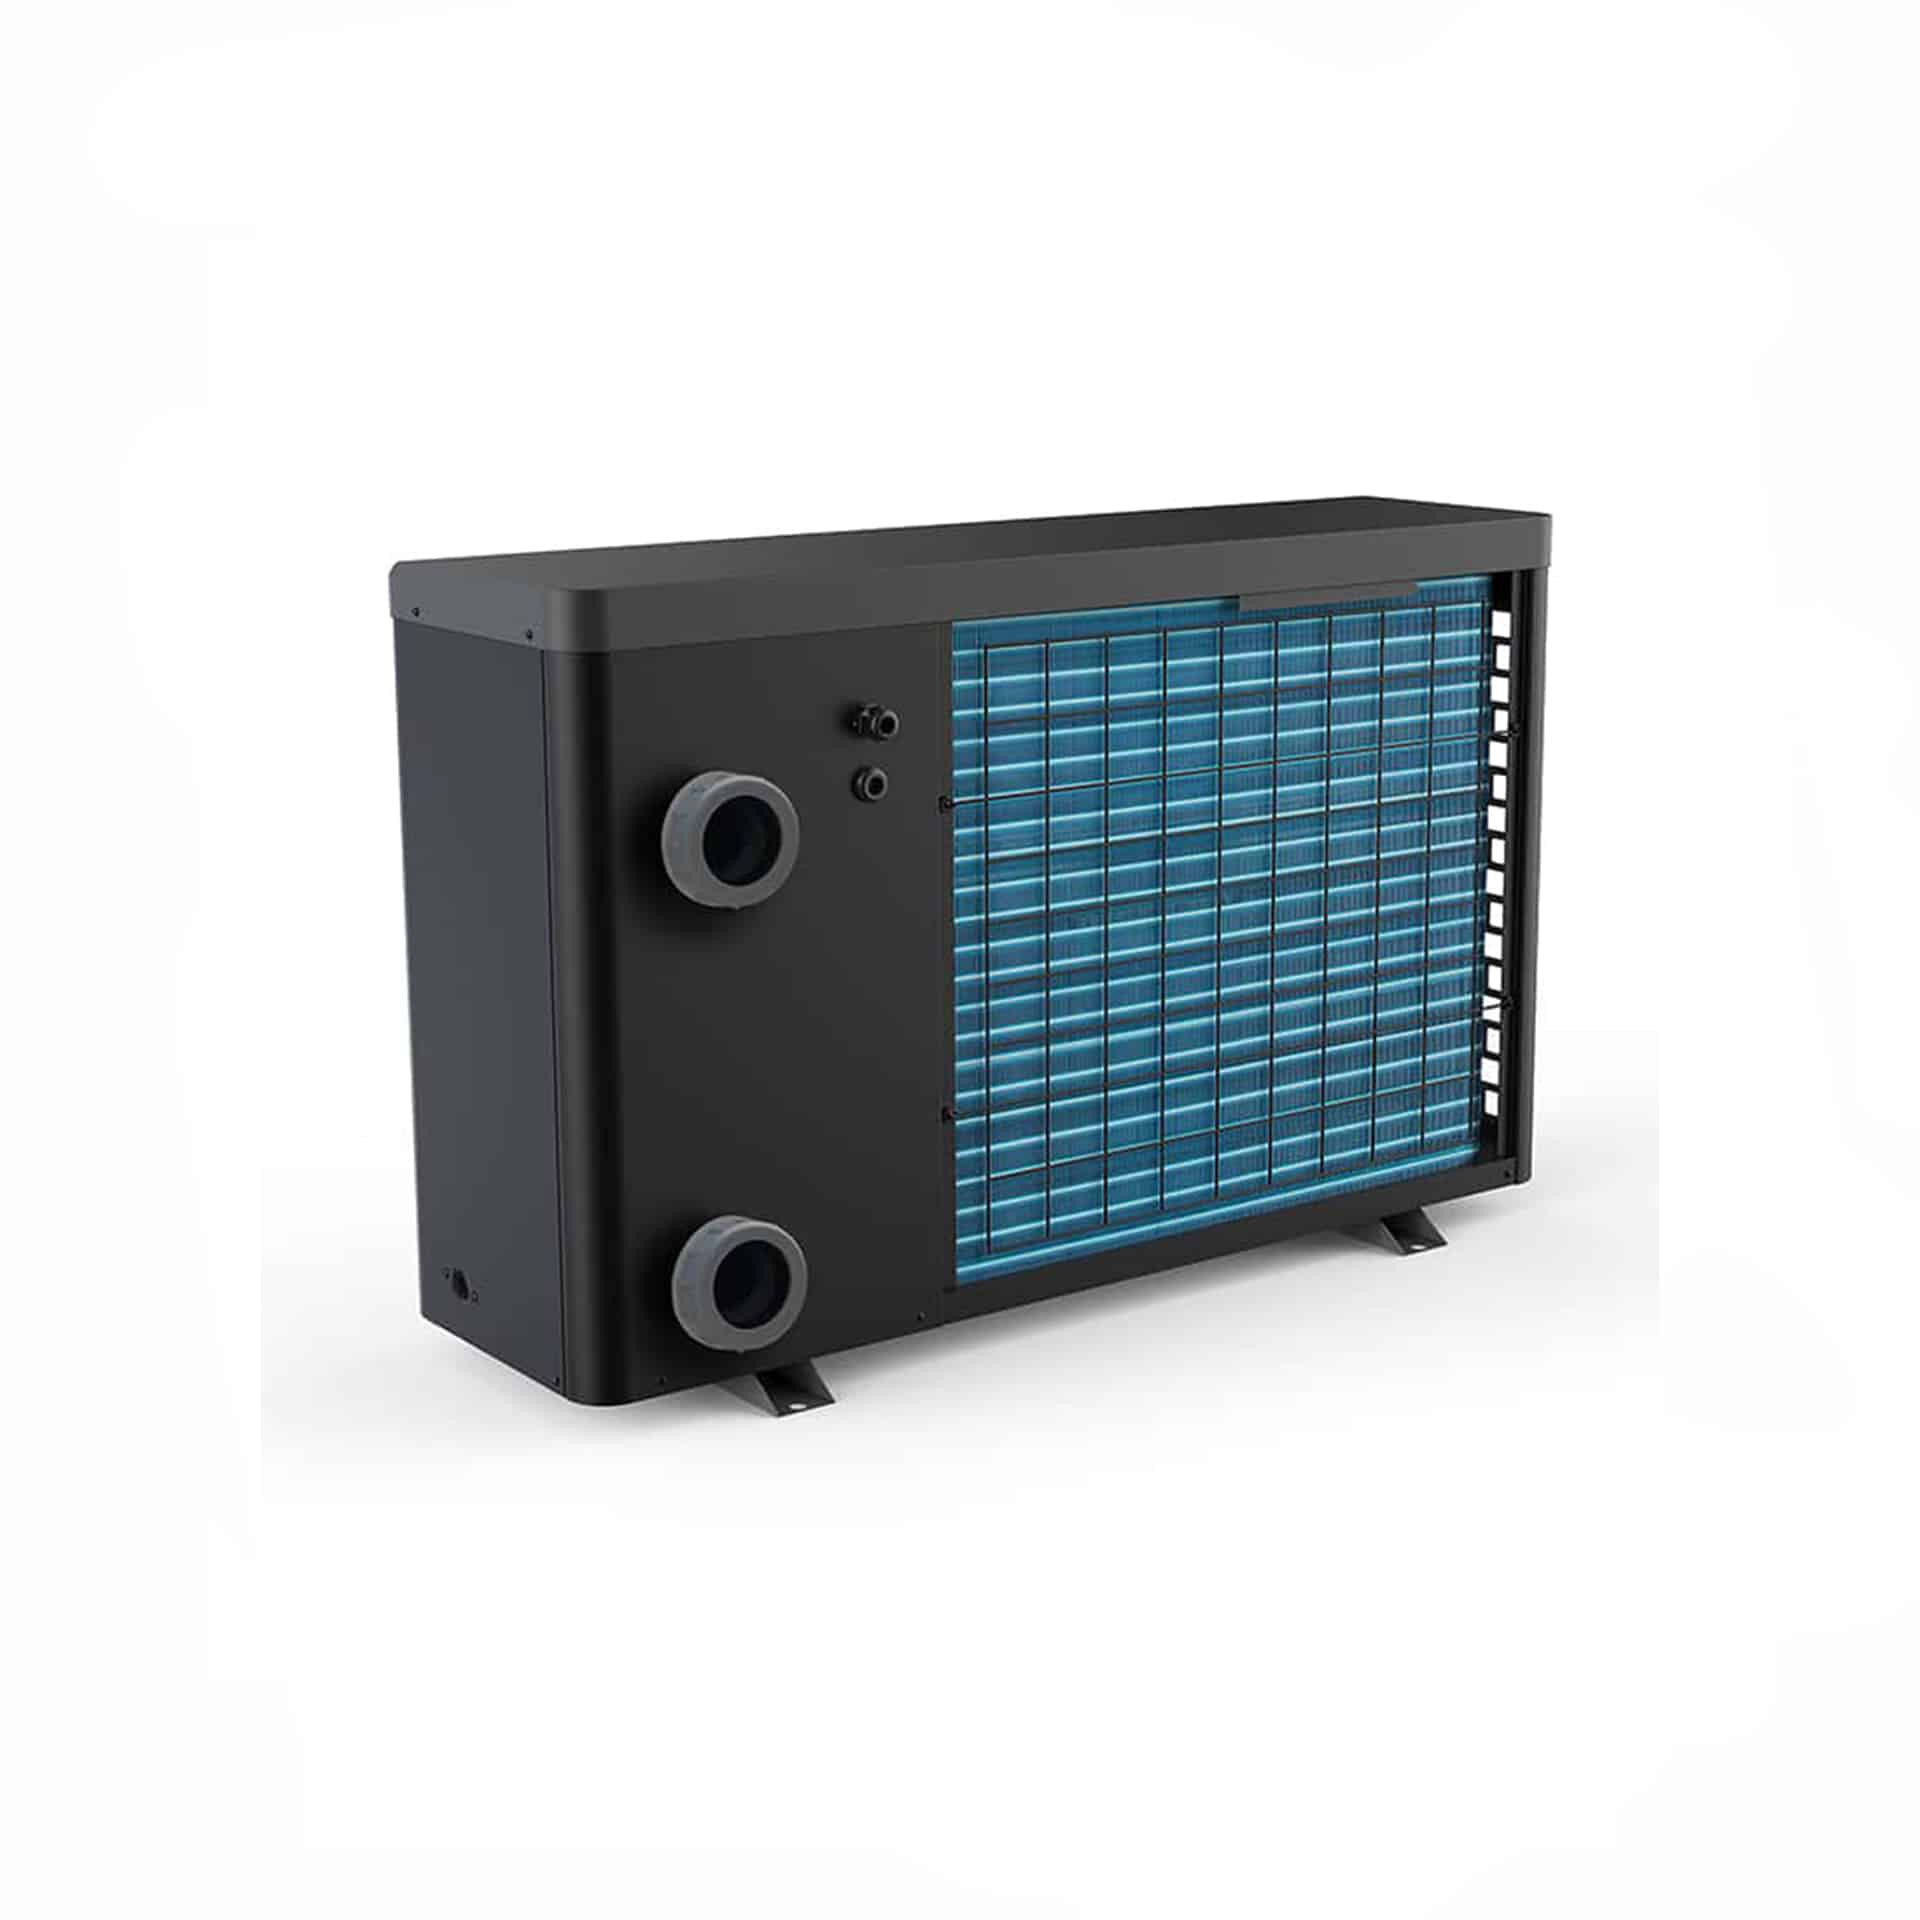 HeatBooster Pro Varmepumpe med WiFi 11 KW bakside